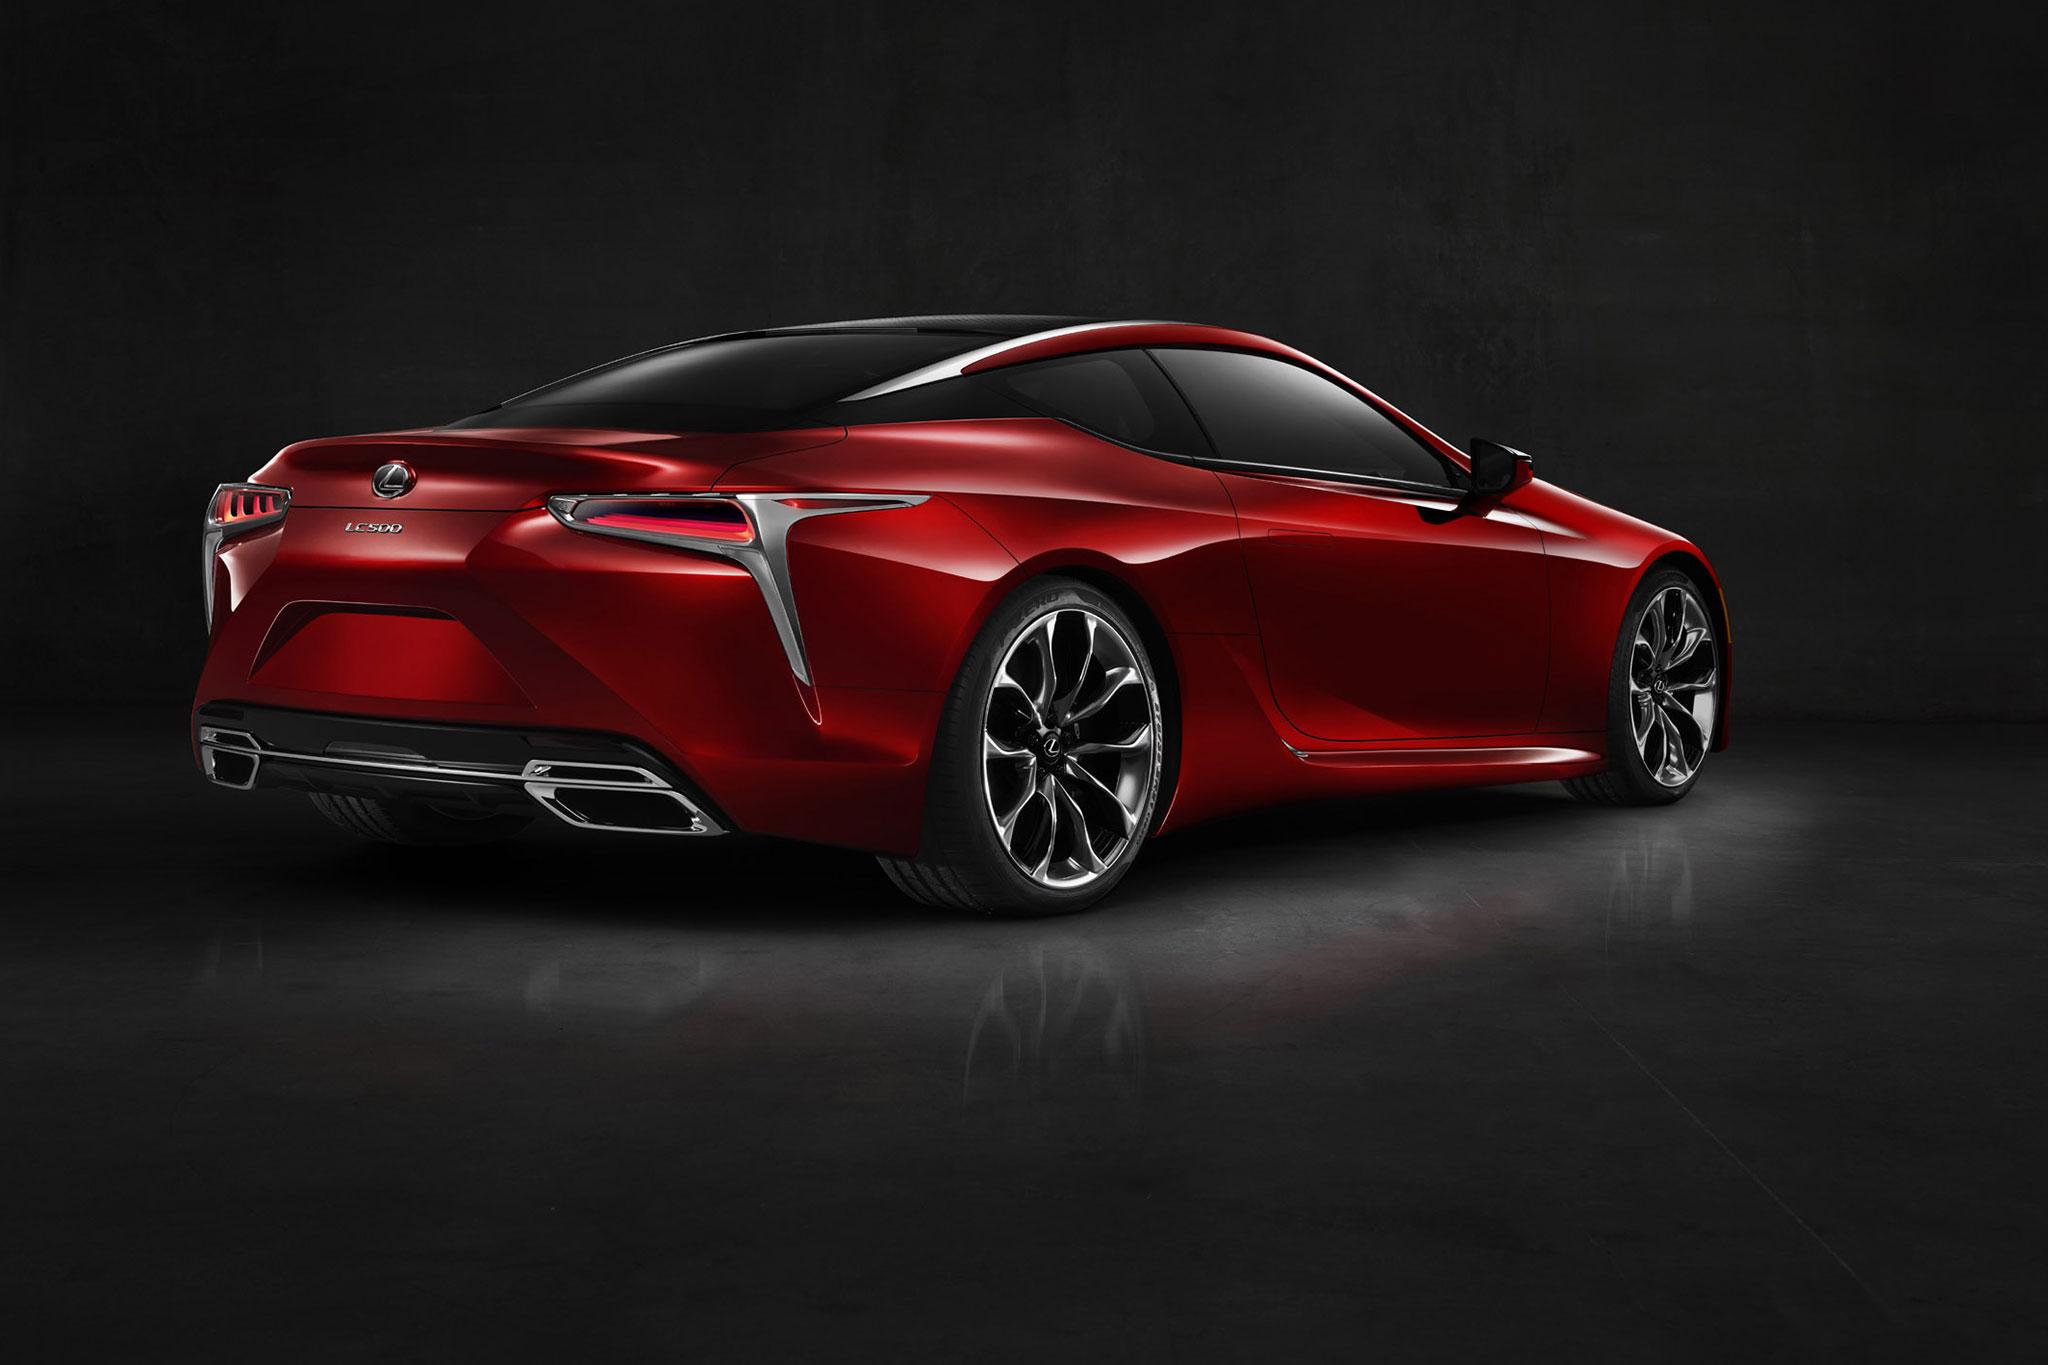 2017 Lexus Lc 500 Toyoda S Vision For Lexus Comes Into Focus